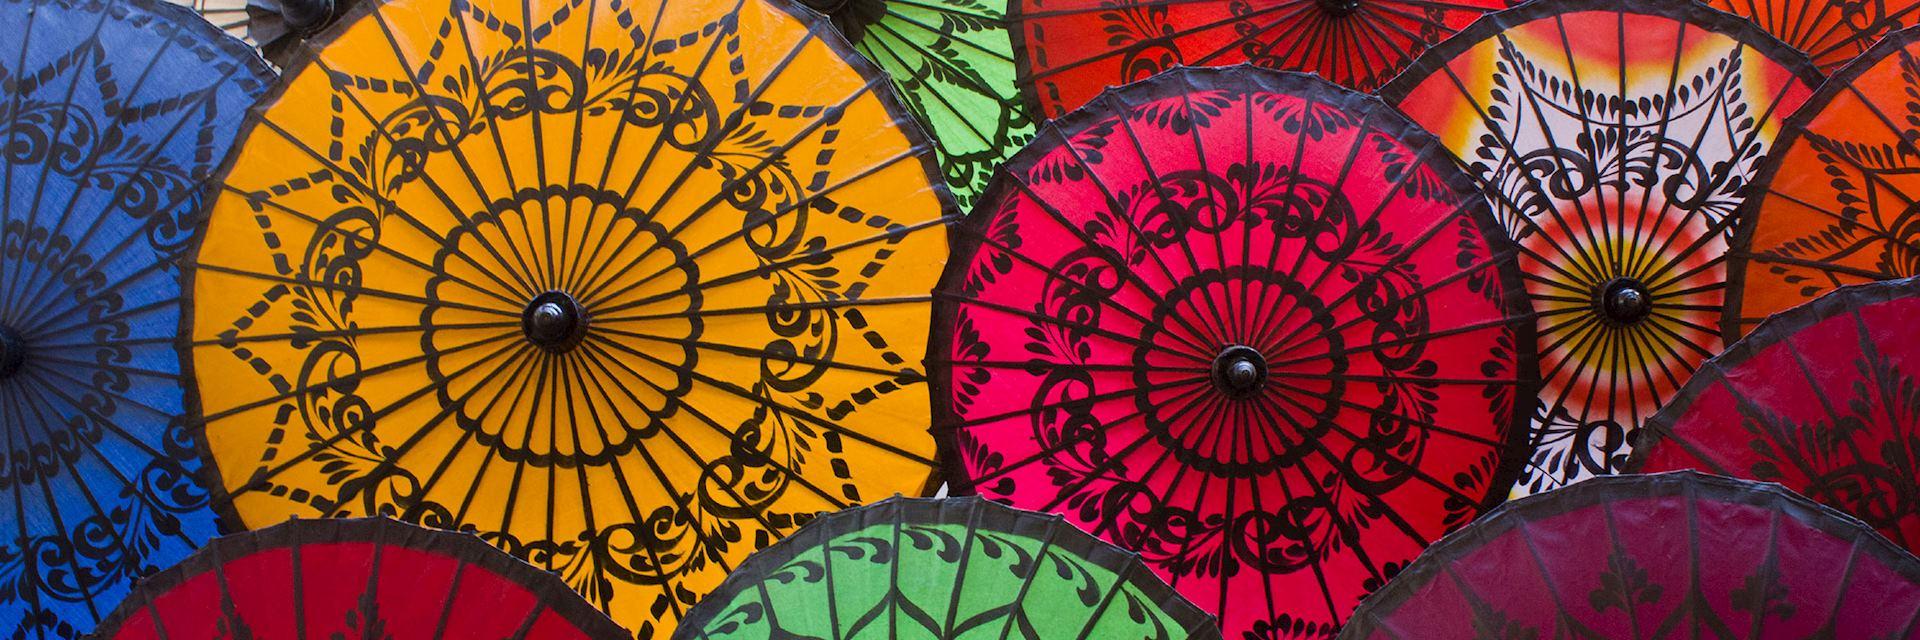 Colourful umbrellas, Burma (Myanmar)